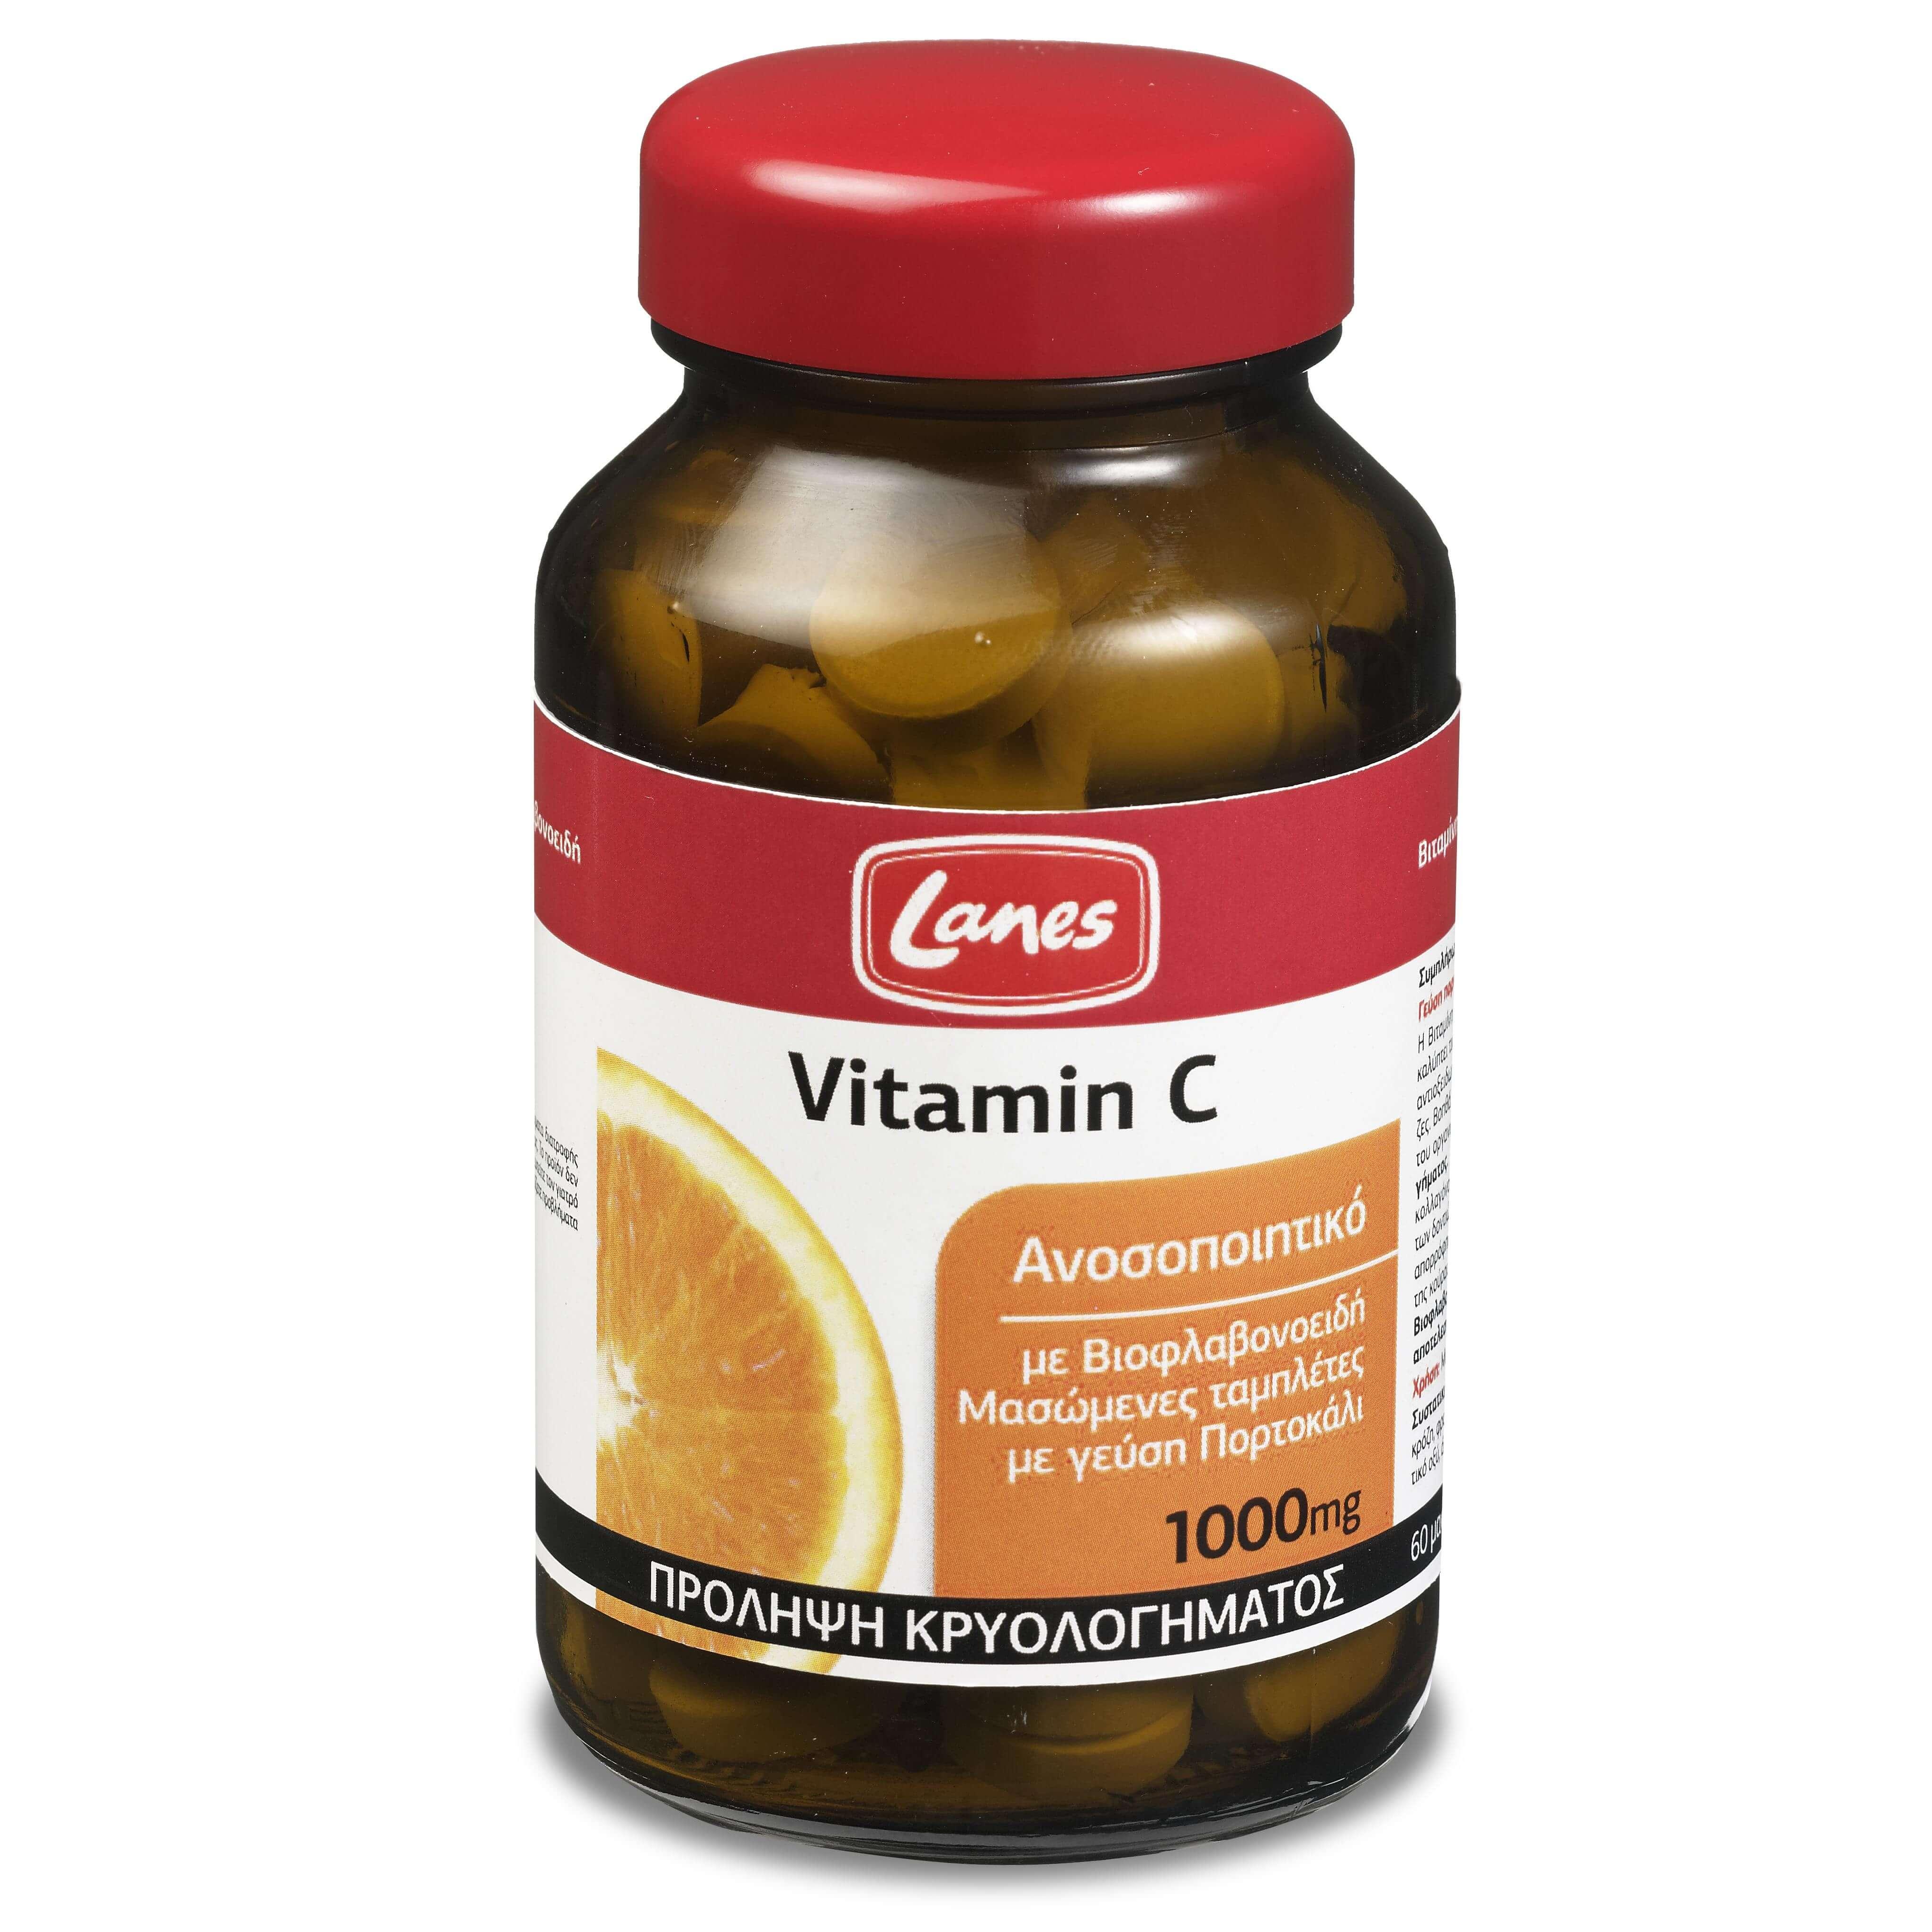 Lanes Vitamin C 1000mg, Συμπλήρωμα Διατροφής με βιτ. C & Βιοφλανοειδή για Ενίσχυση του Ανοσοποιητικού 60 Chew.Tabs